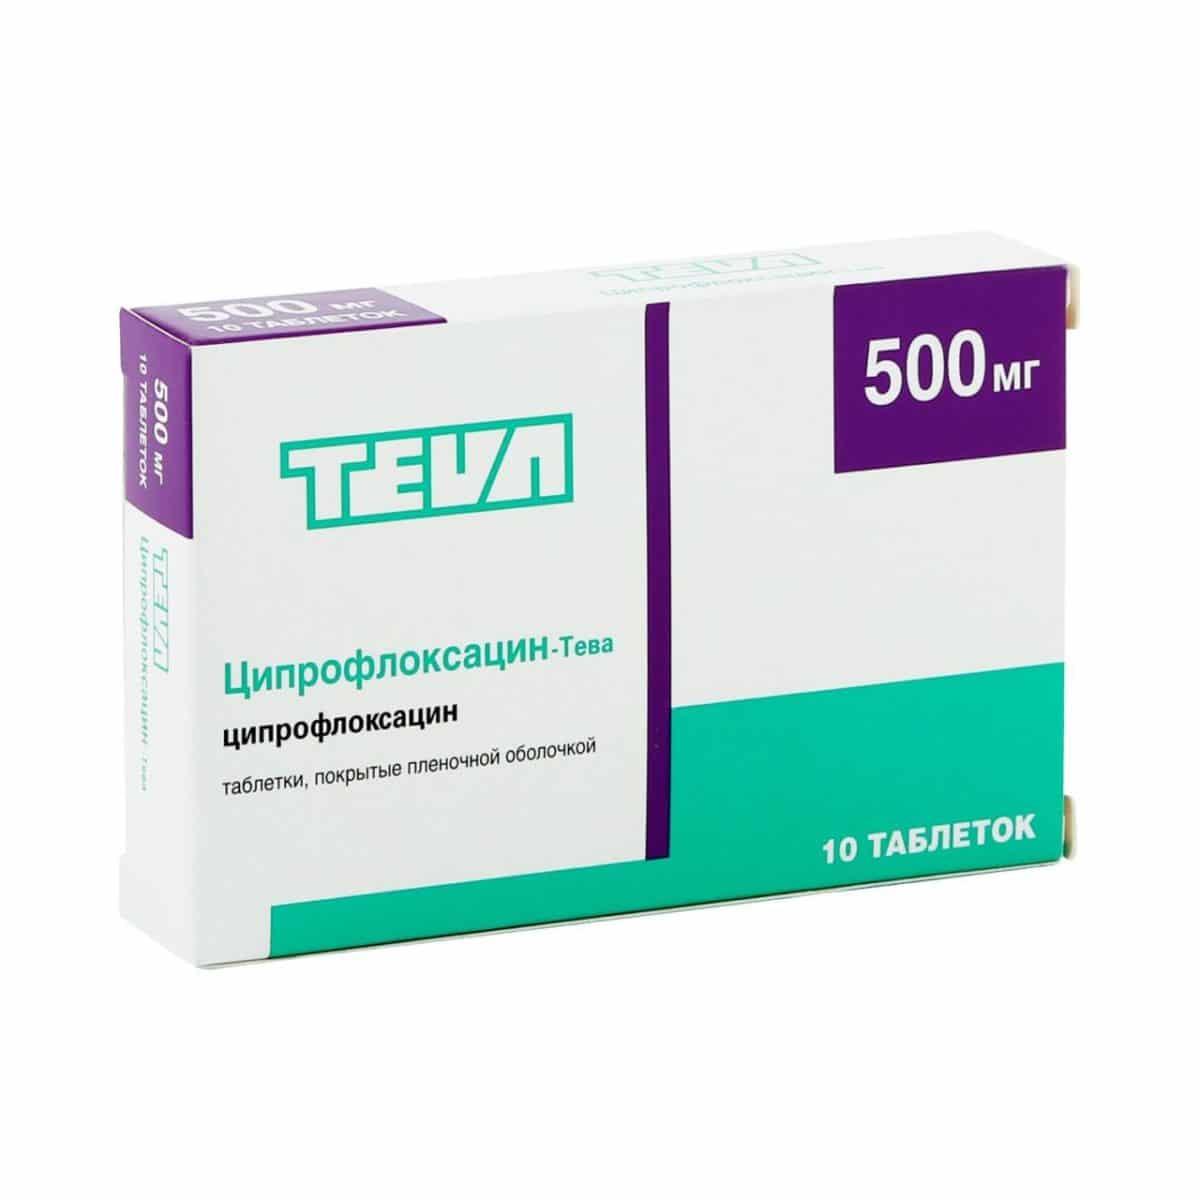 Ципрофлоксацин Тева